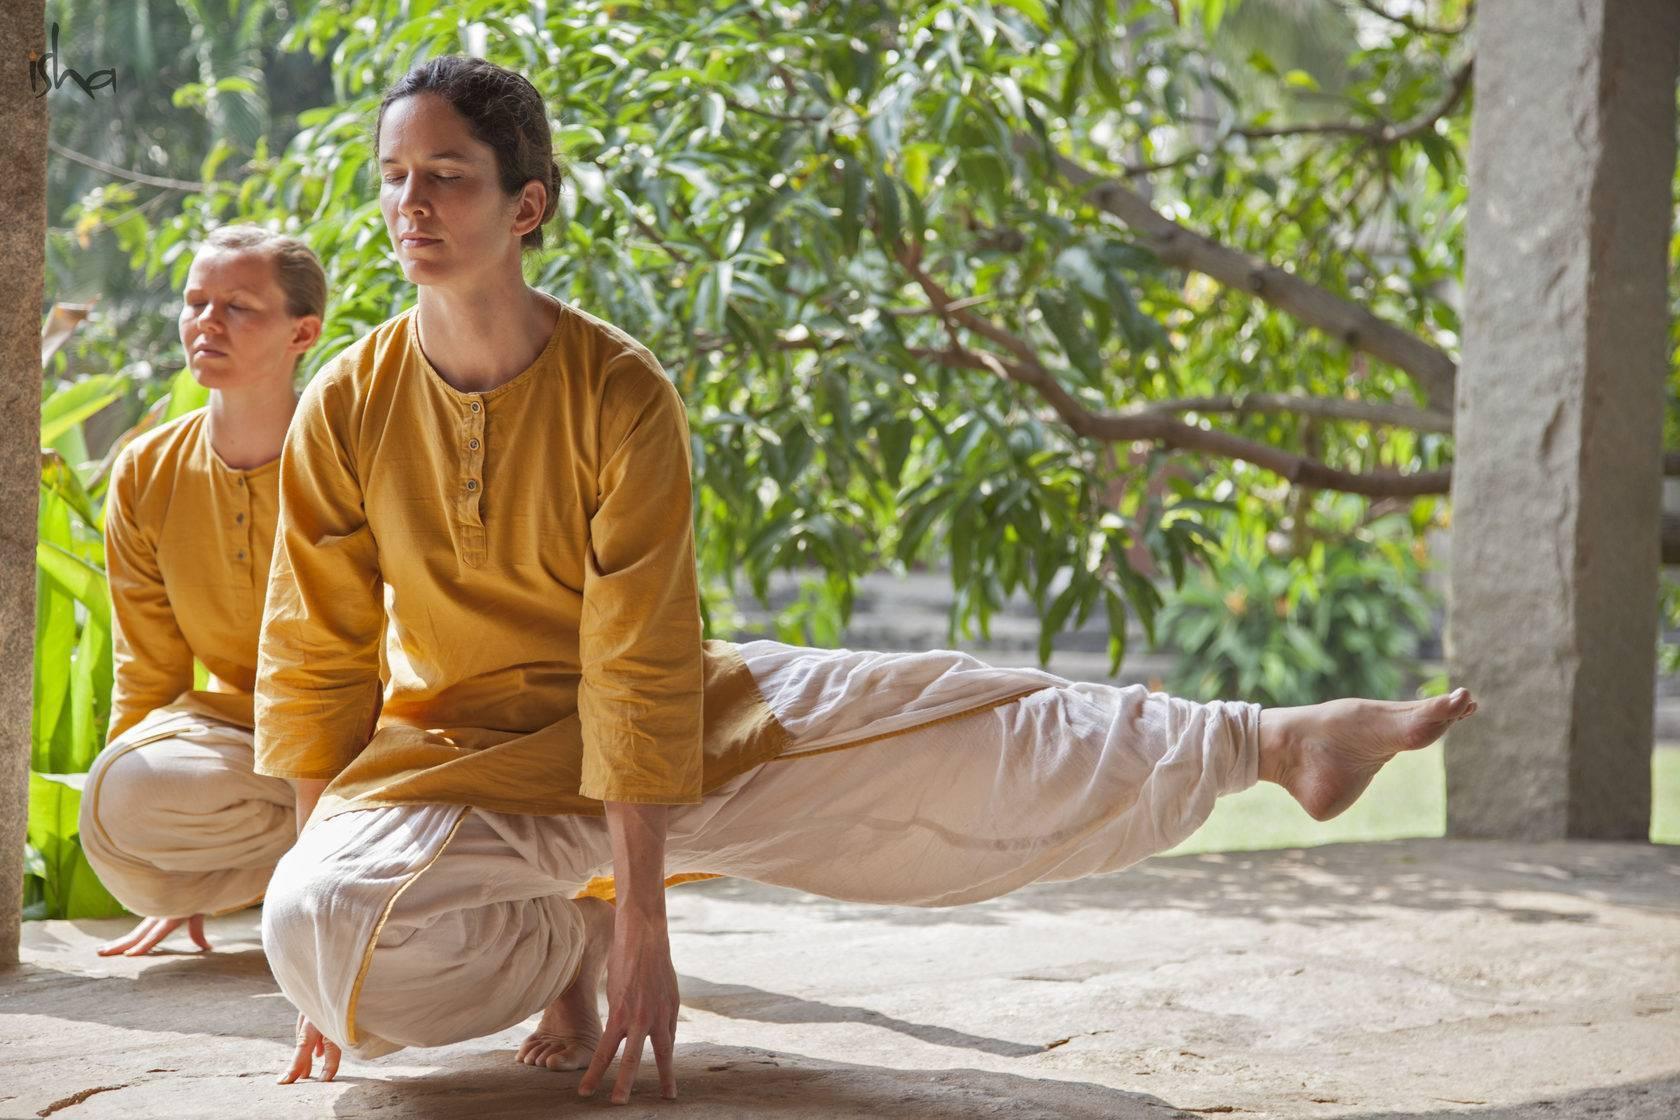 История возникновения и развития йоги презентация, доклад